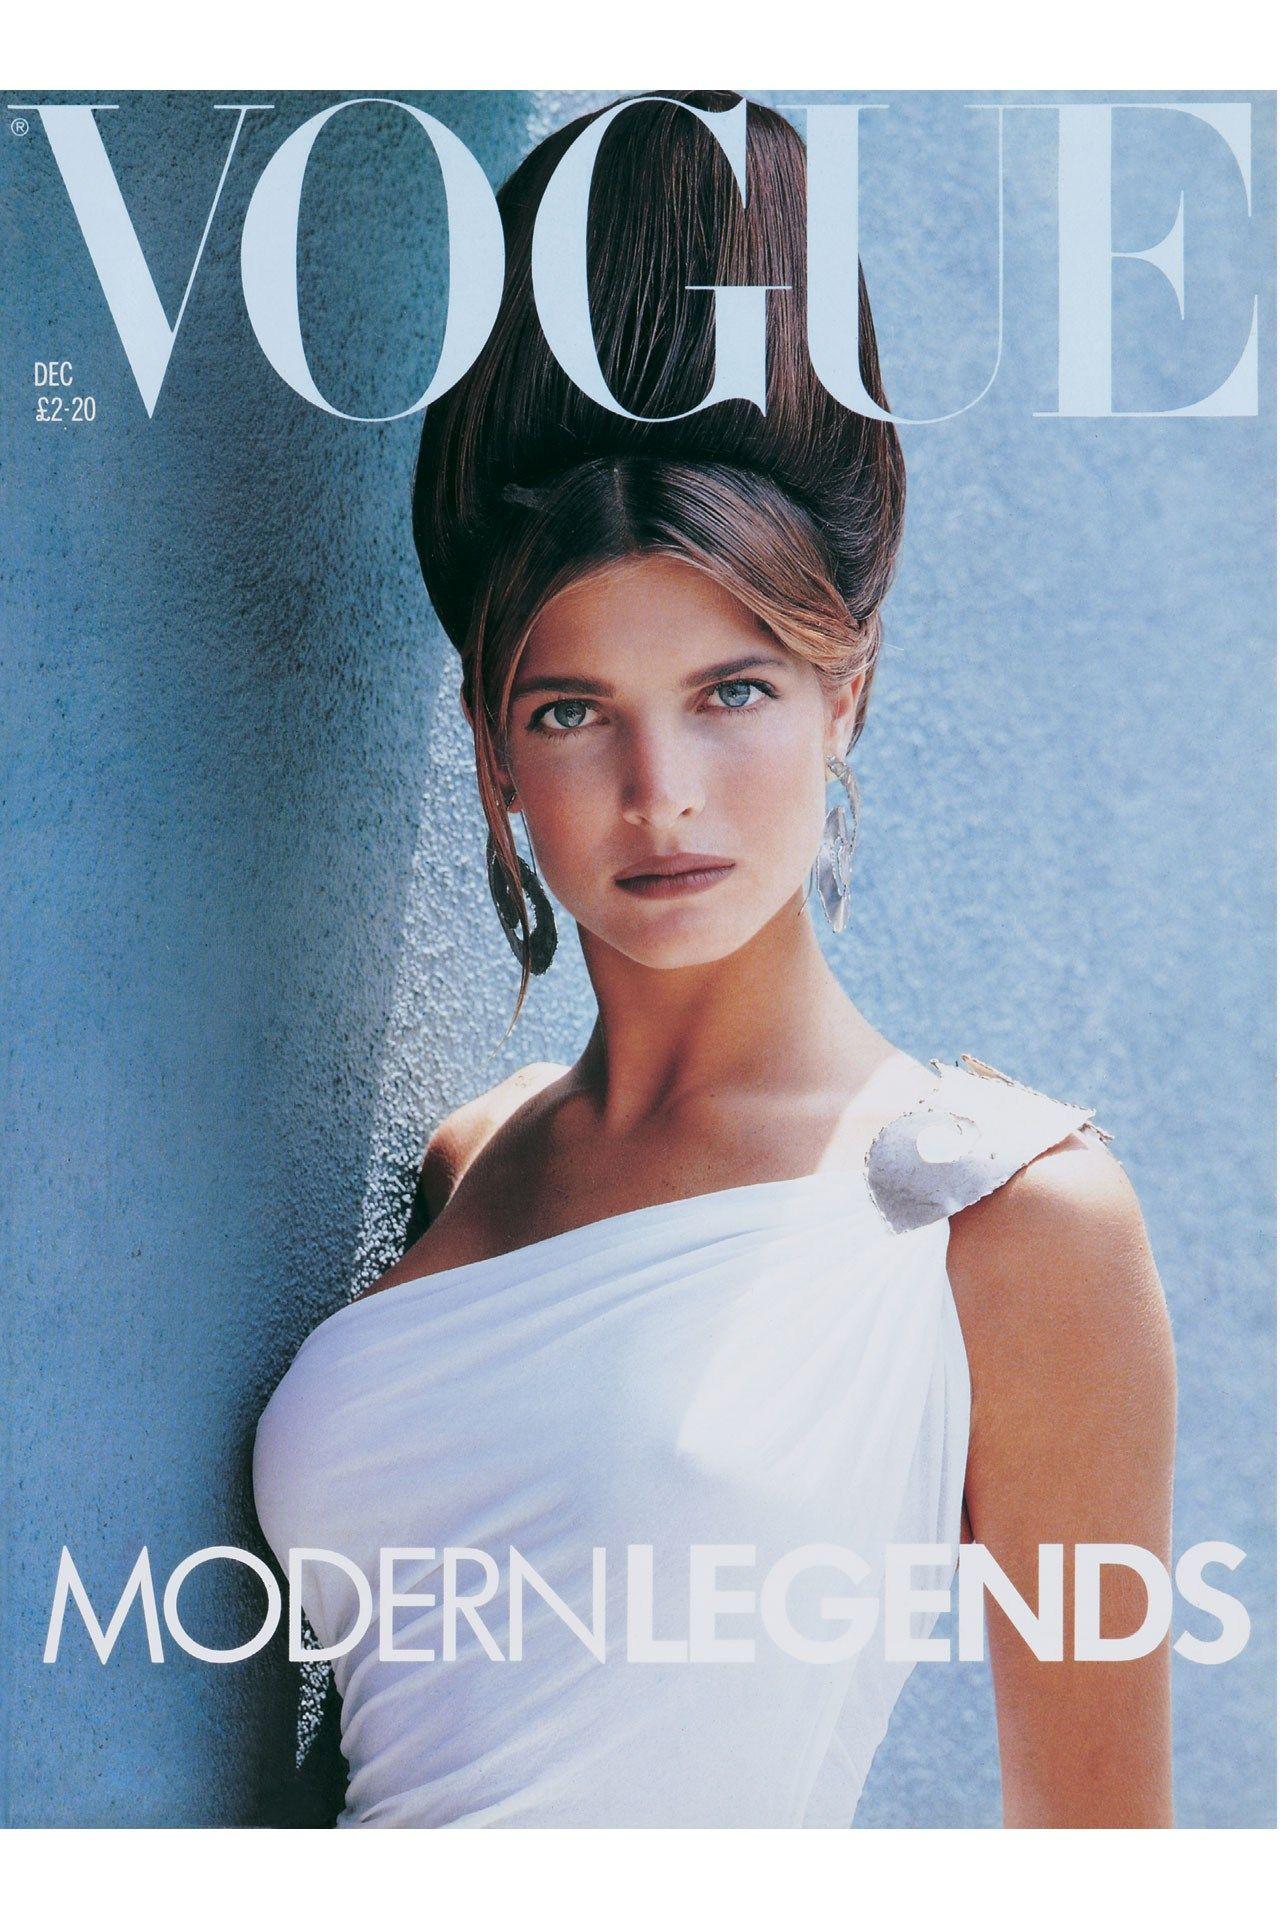 Vogue Magazine | Stephanie seymour, Fashion magazine cover ...